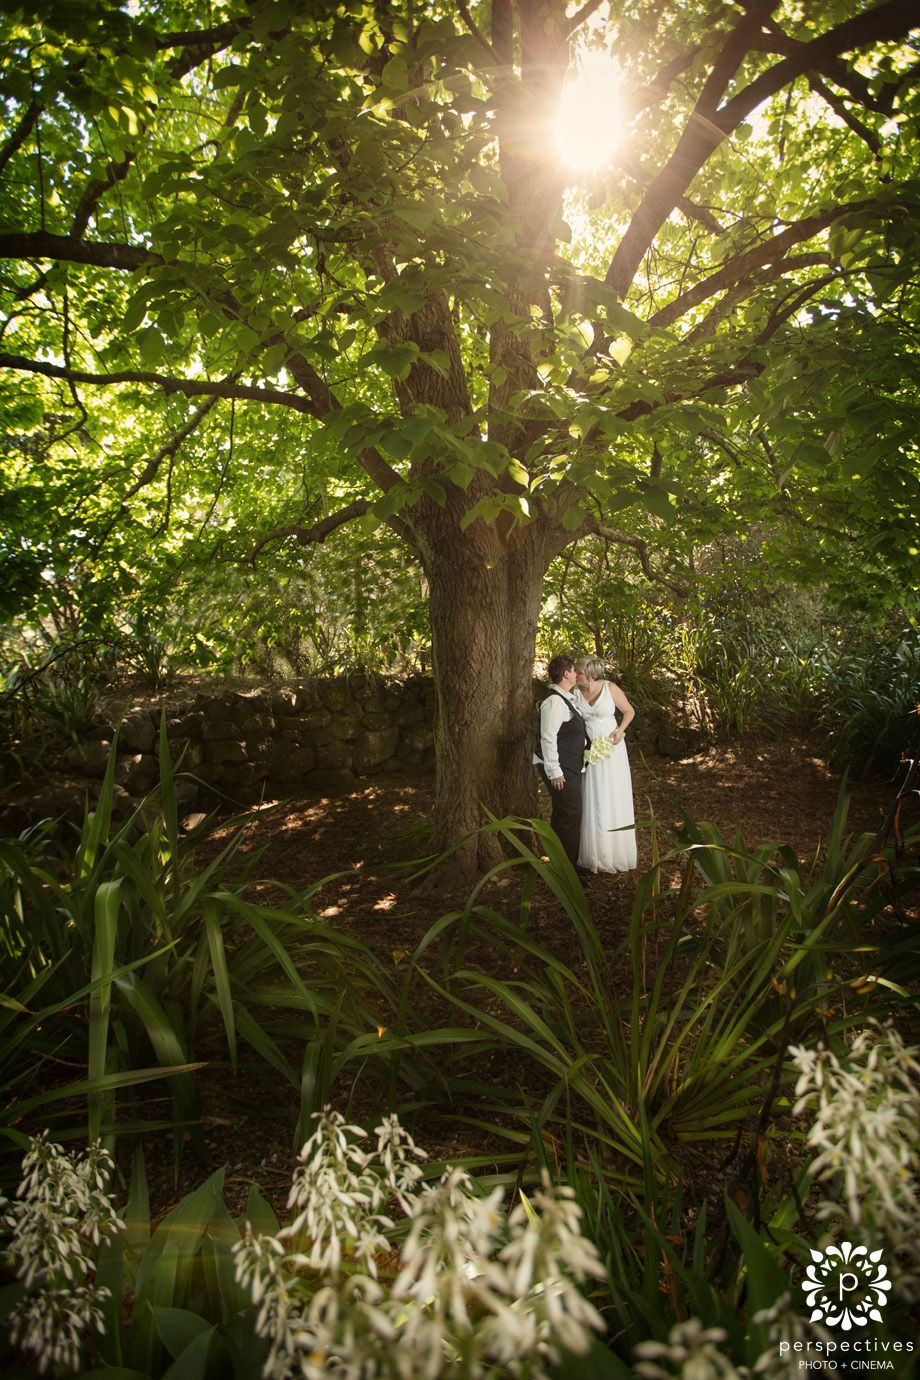 Auckland Zoo Wedding Photos Zoo wedding, Photo